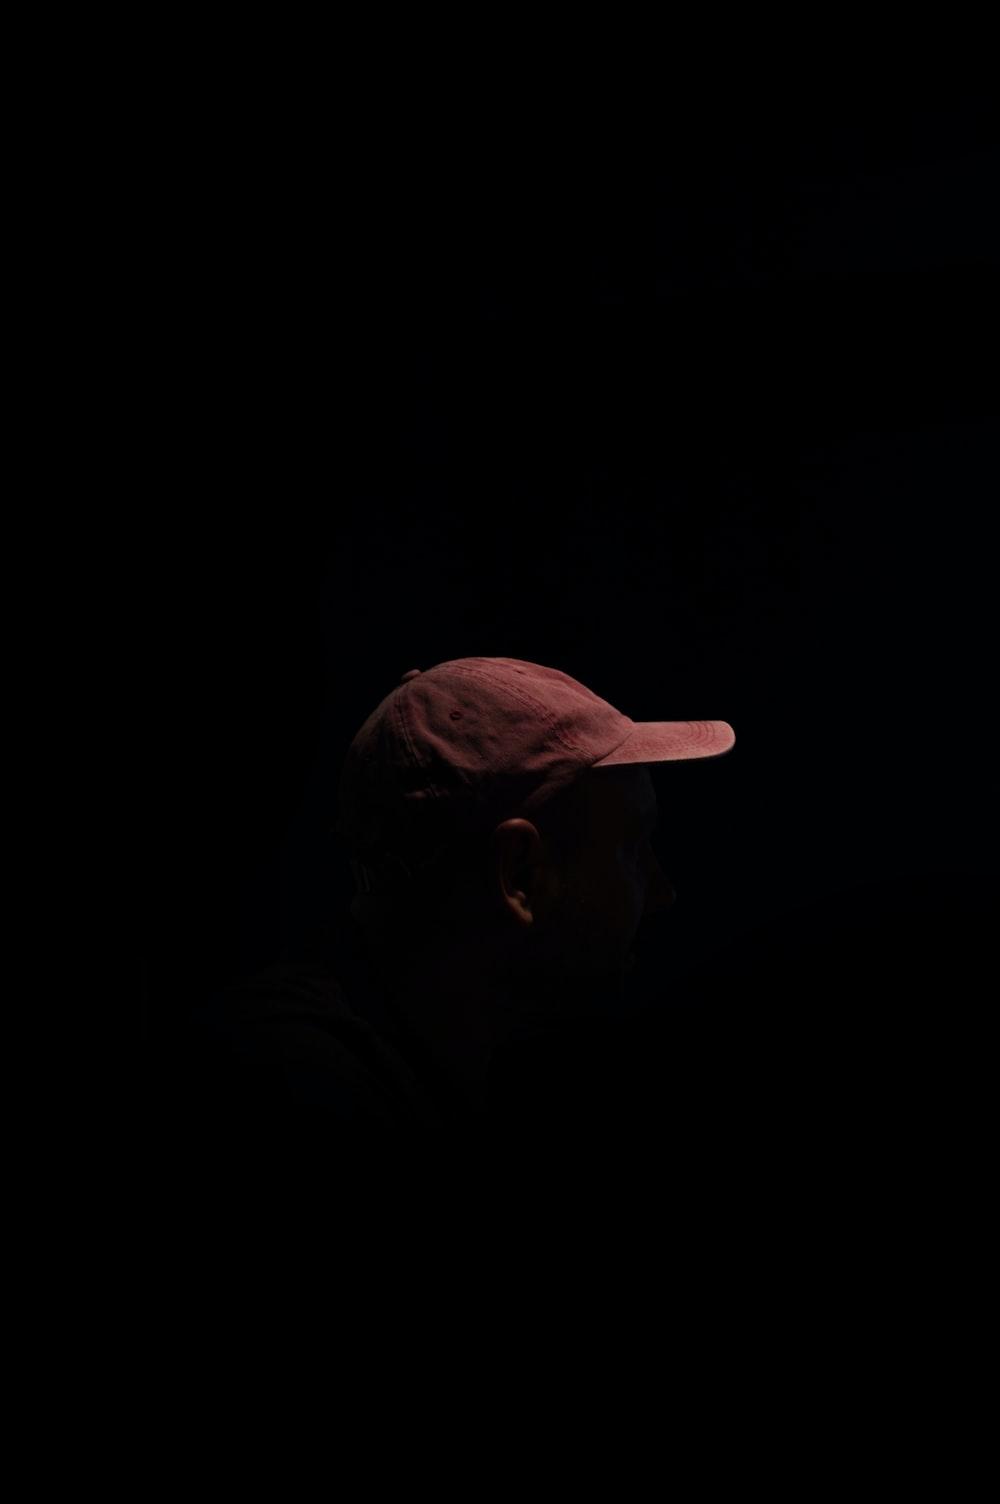 person wearing brown cap